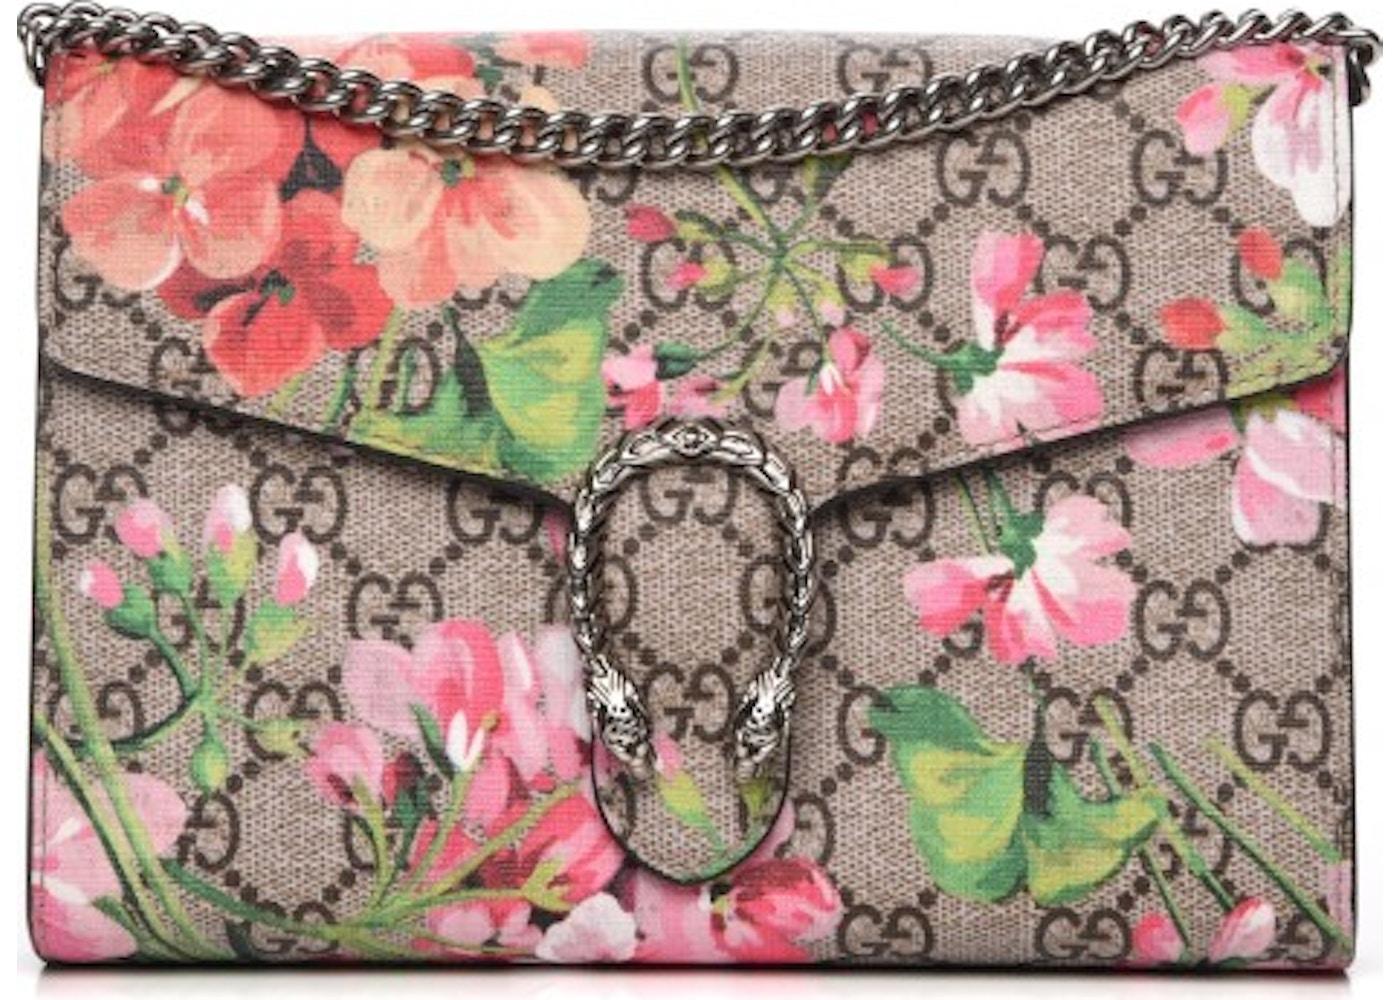 6f184626beaa17 Gucci Chain Wallet Dionysus Gg Supreme Beige Canvas Cross Body Bag .